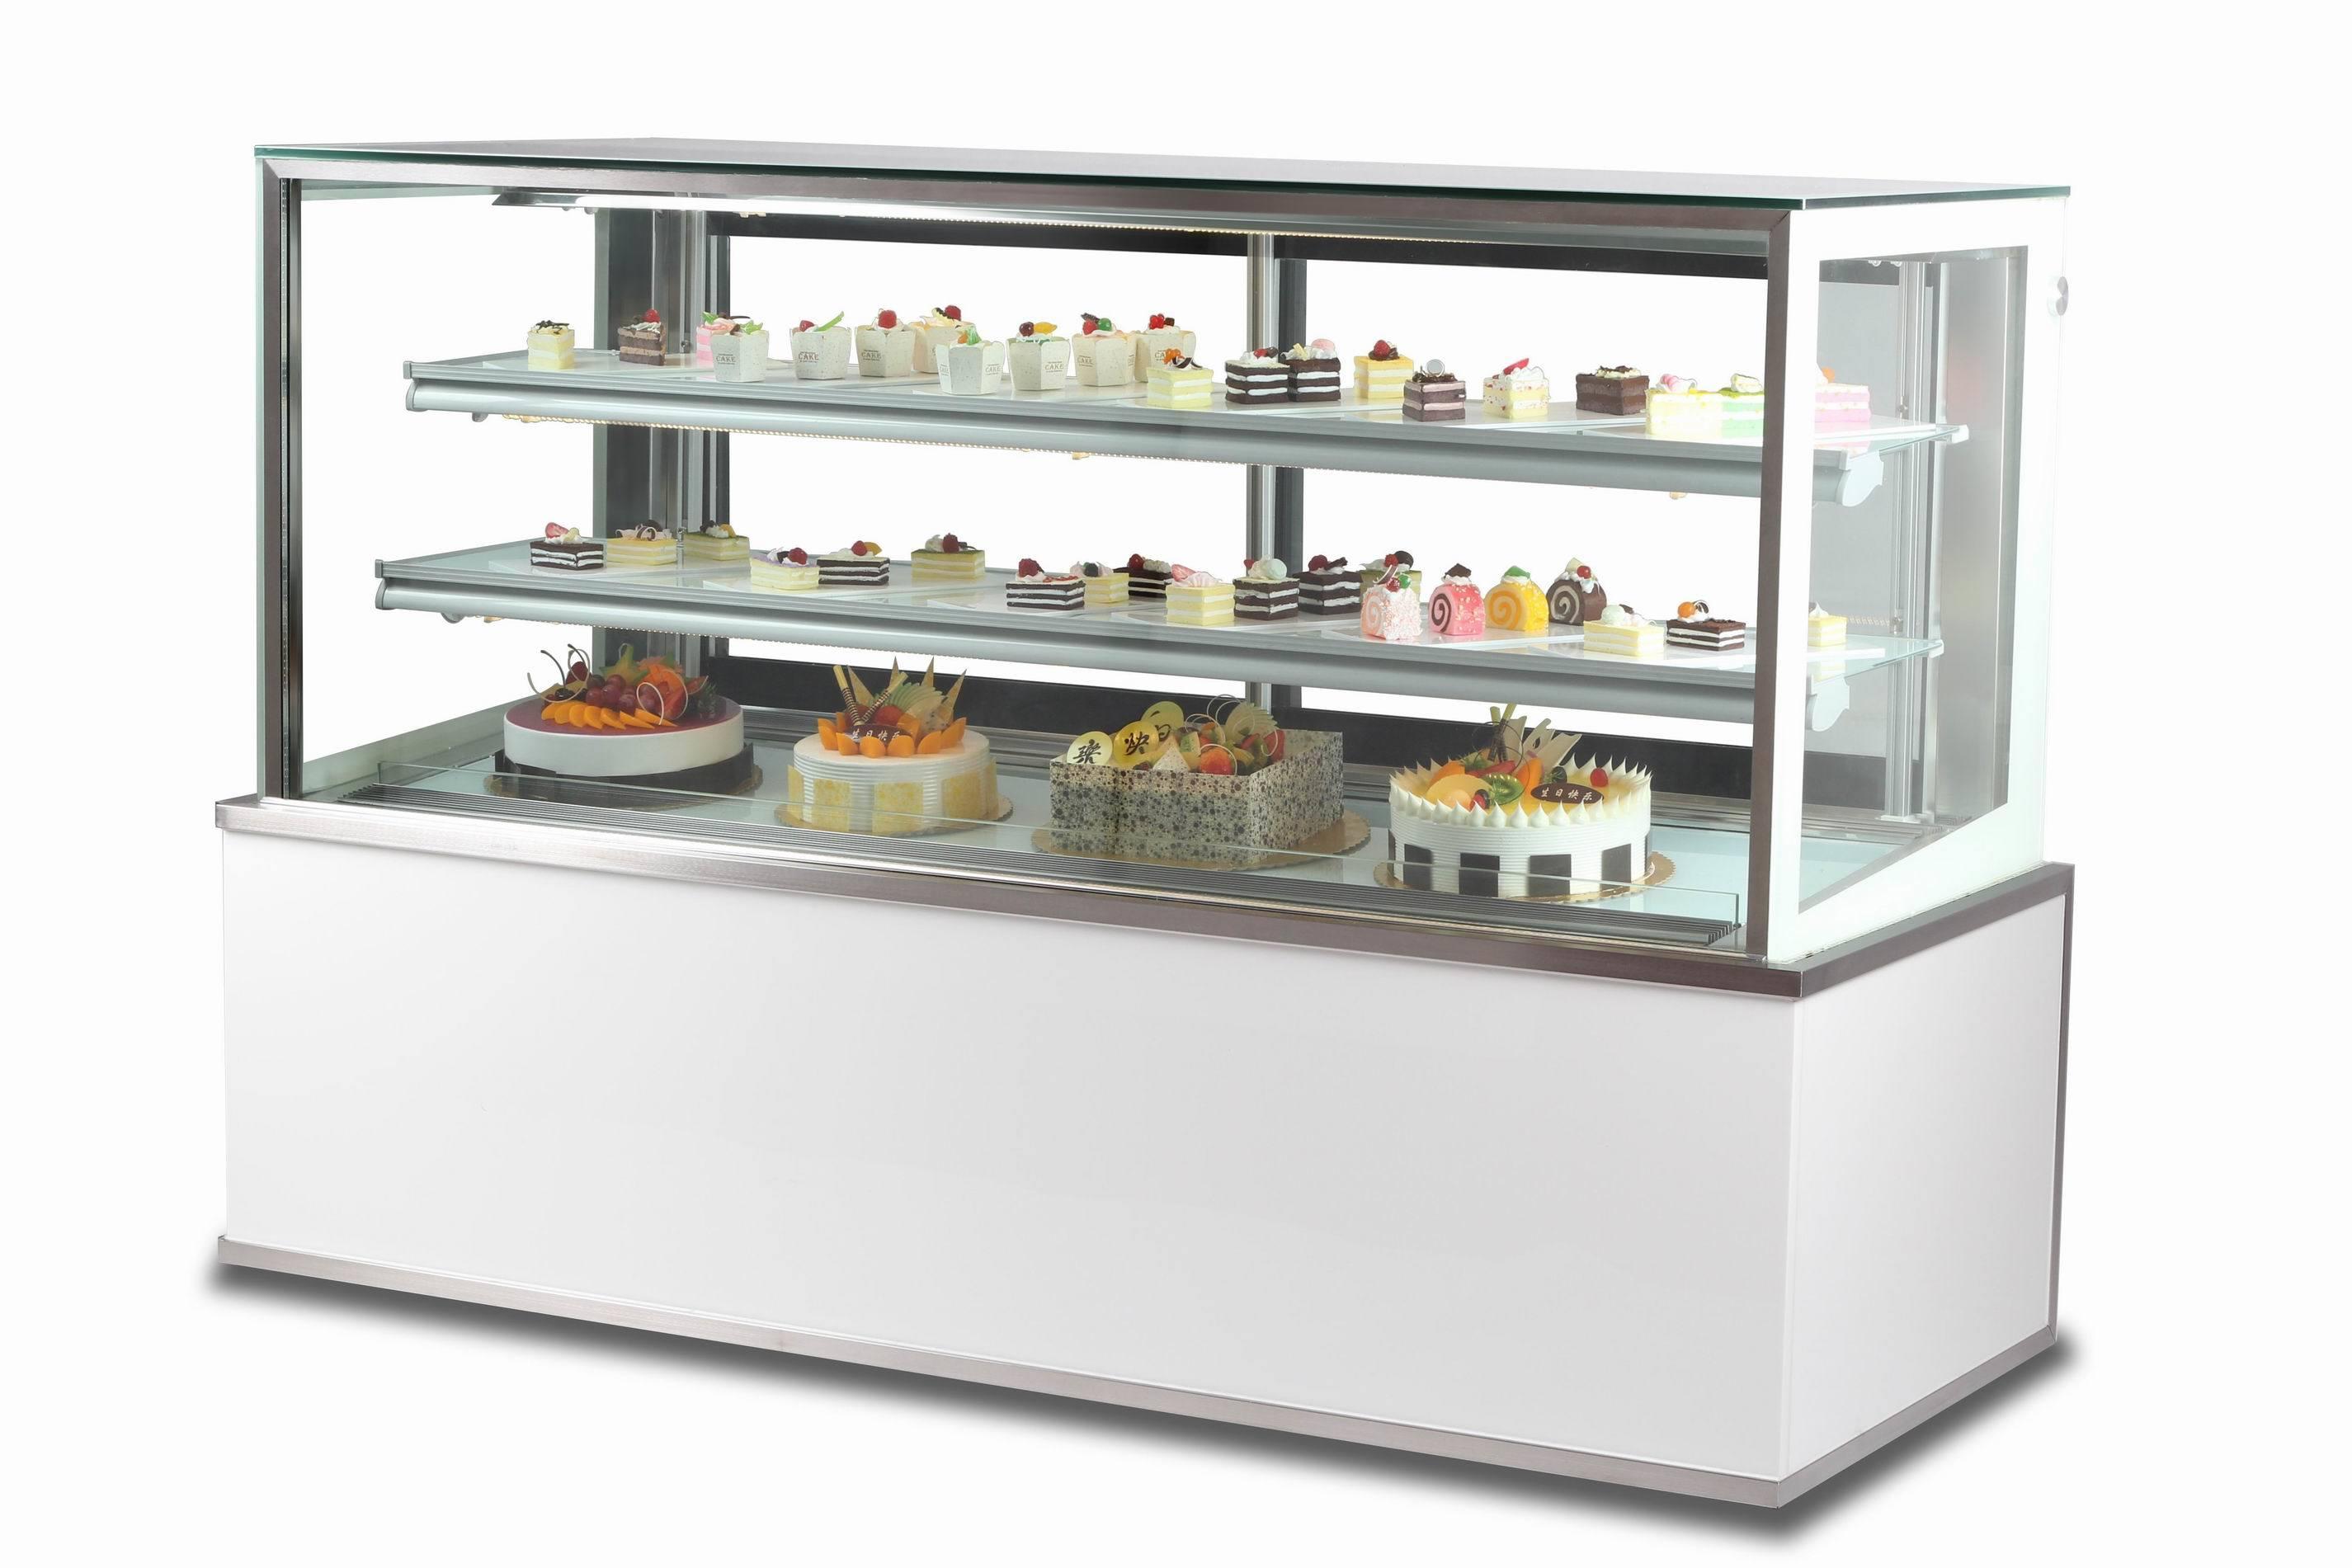 China Cake Display Counter Showcase Fridge China Cake